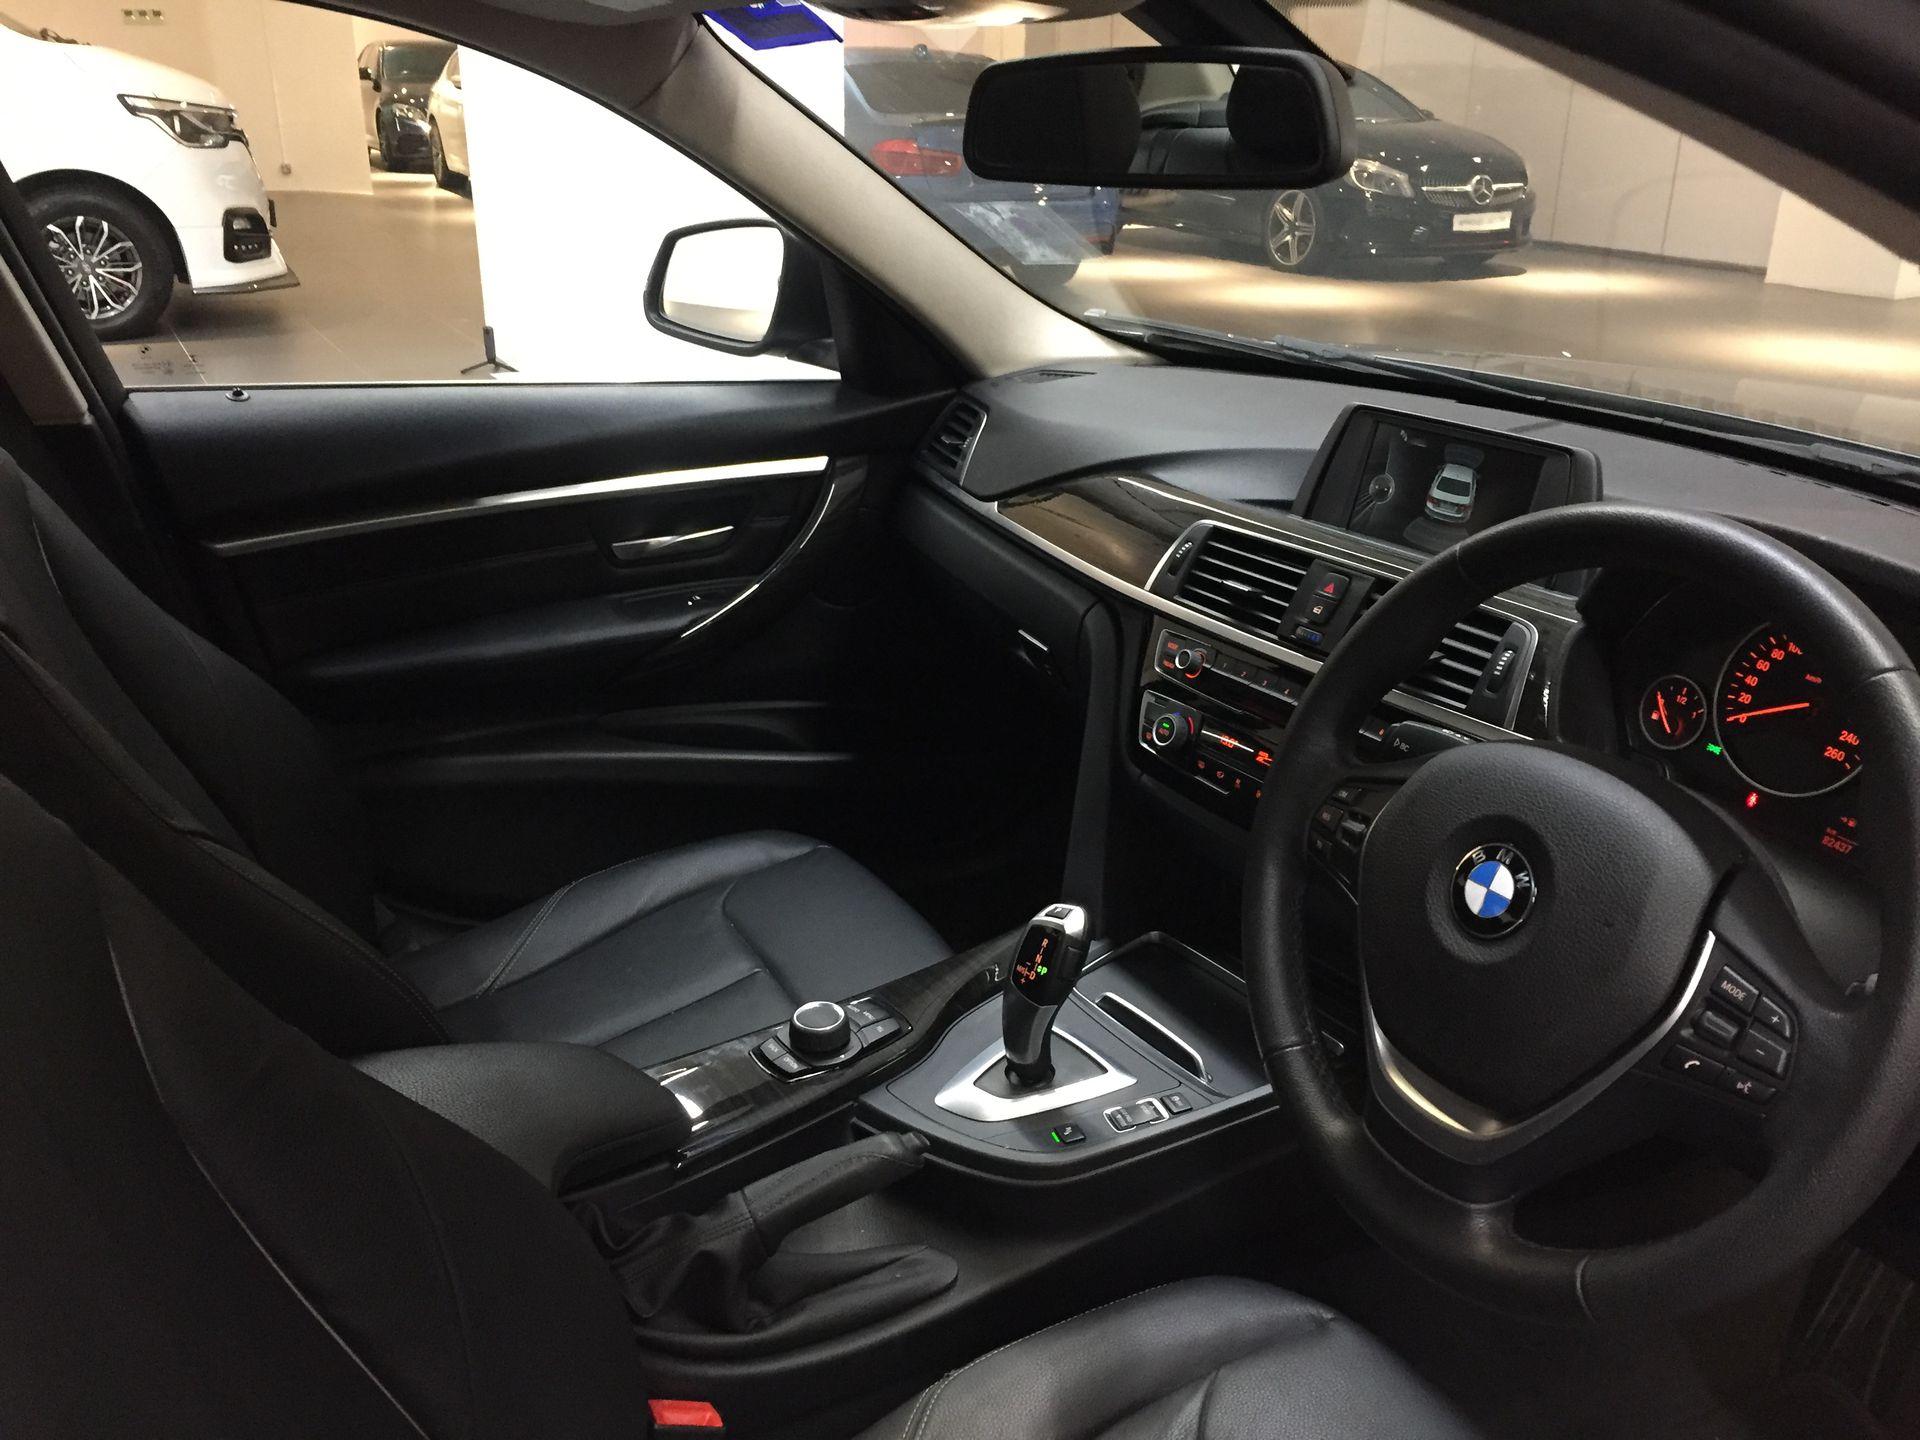 2016 BMW 318i Luxury F30 LCI - CKD